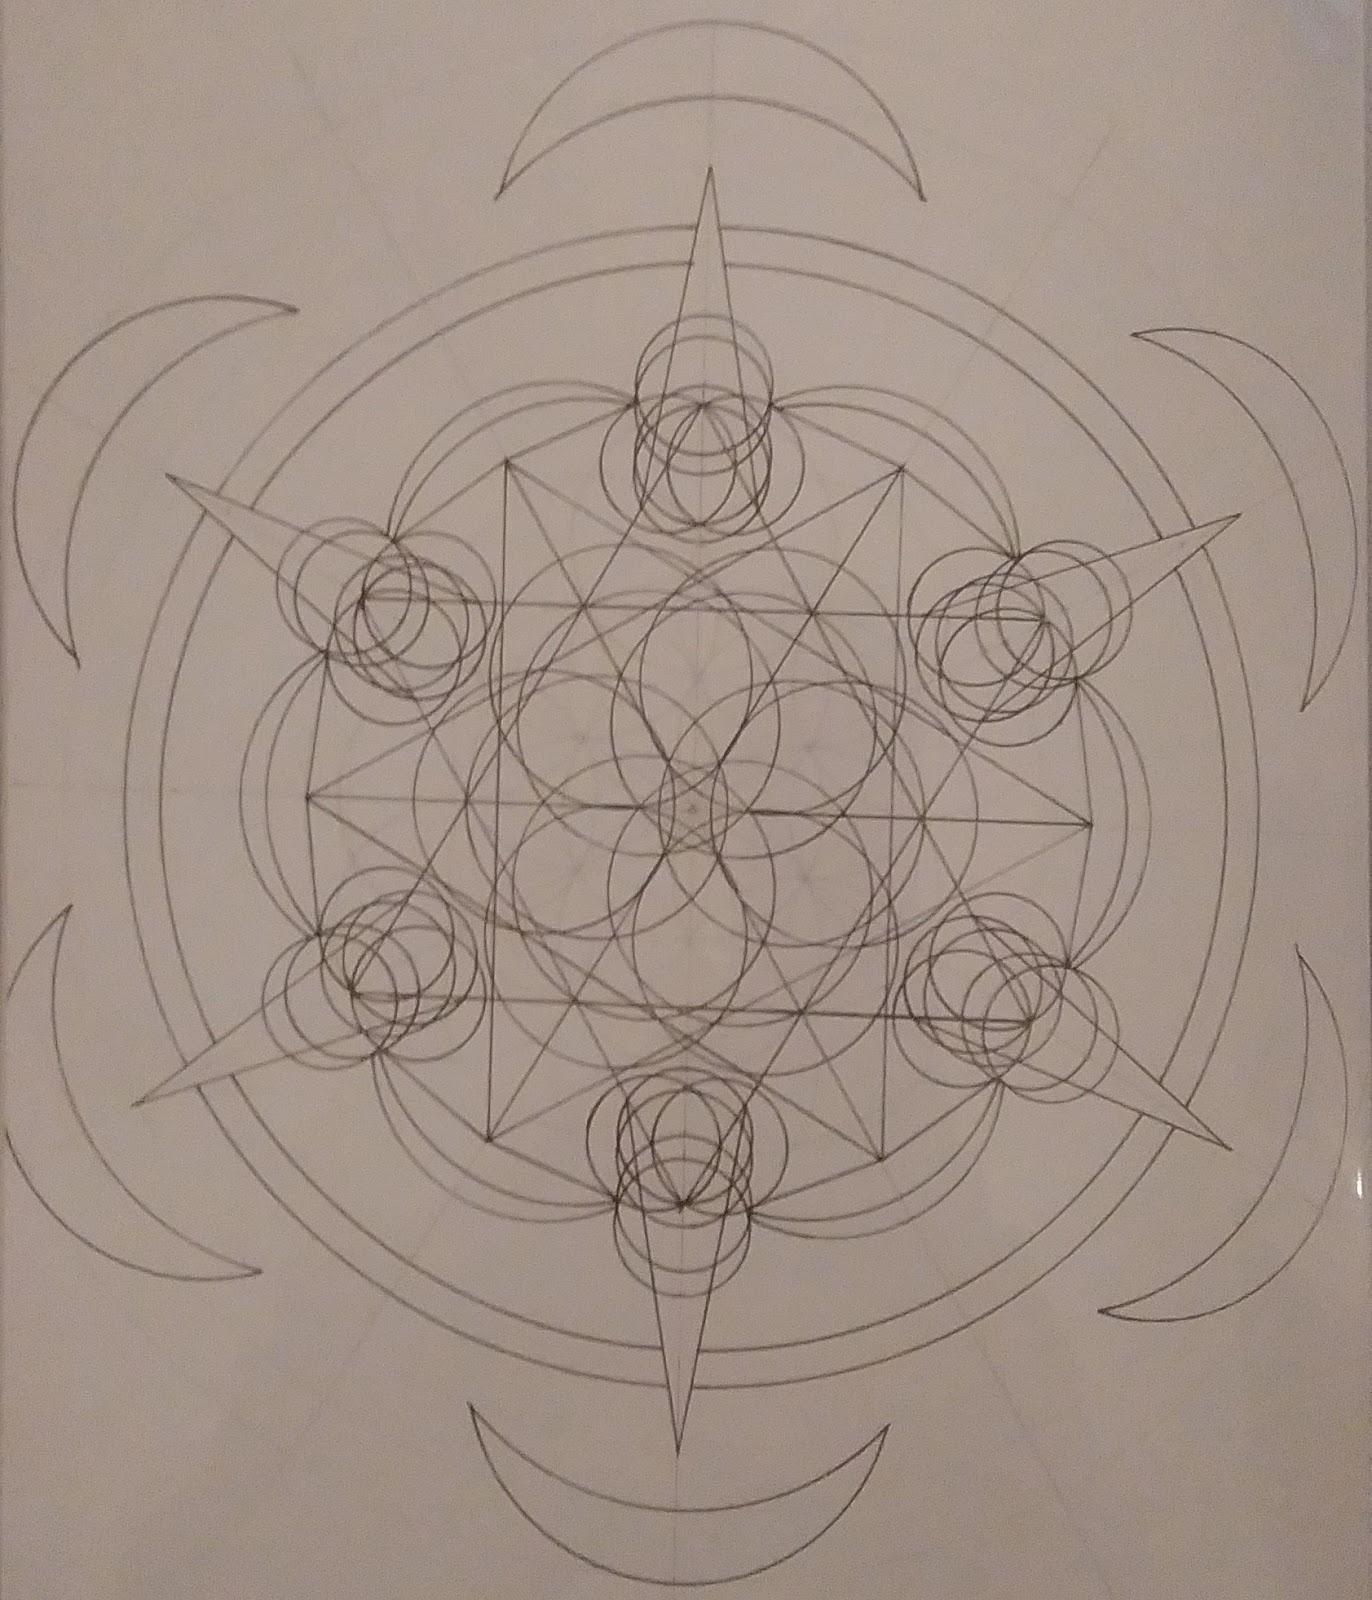 [SPOLYK] - Geometries & sketches - Page 6 48051489_1103195579867125_8908184904060108800_o